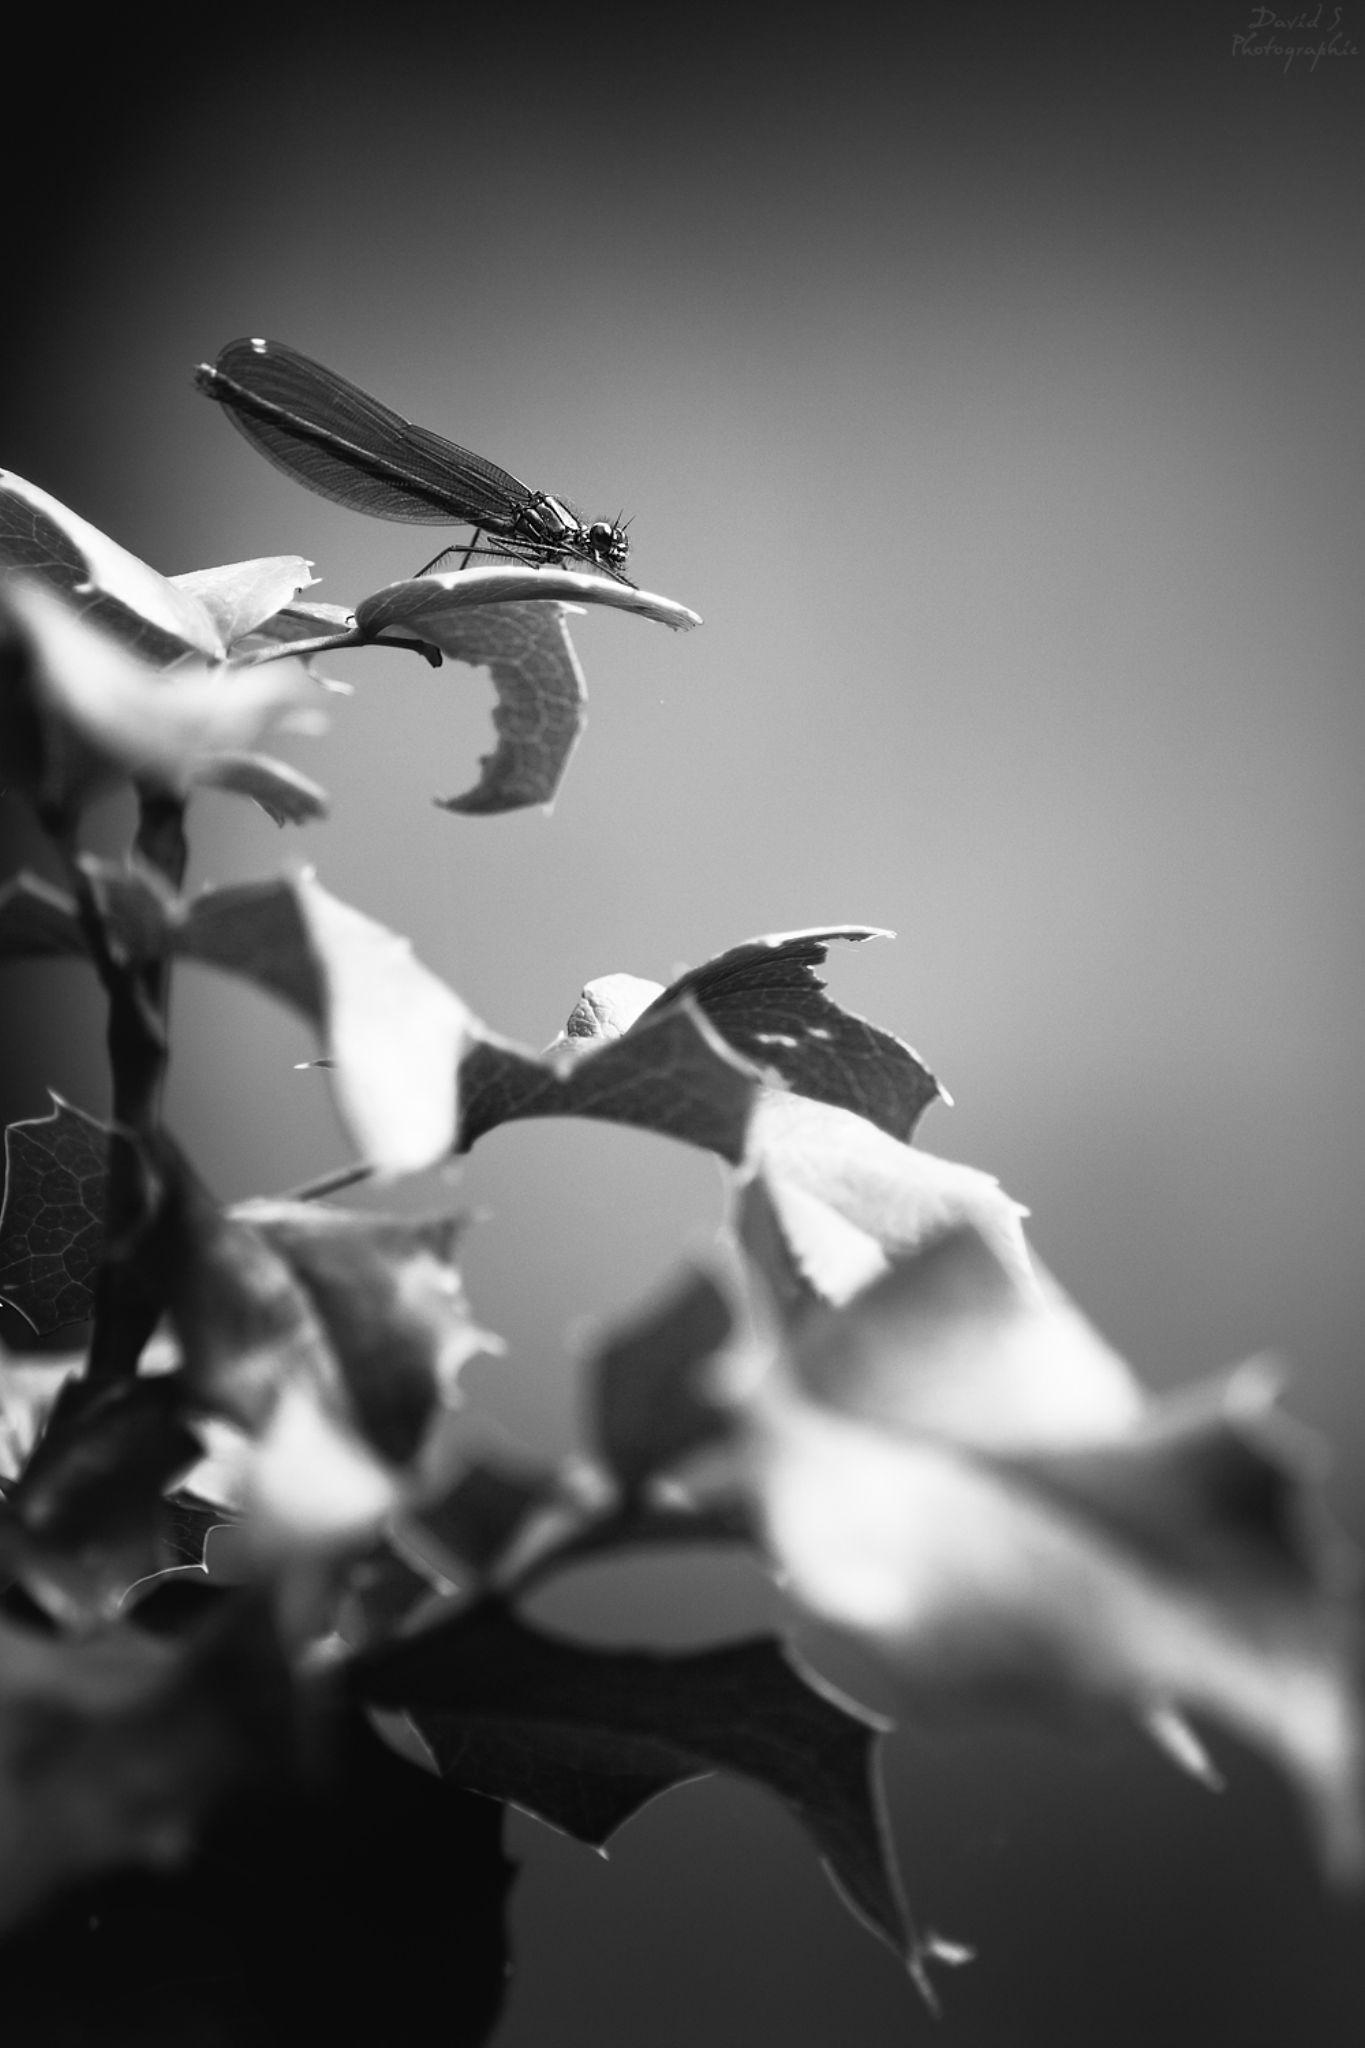 Dragonfly by David Salobir